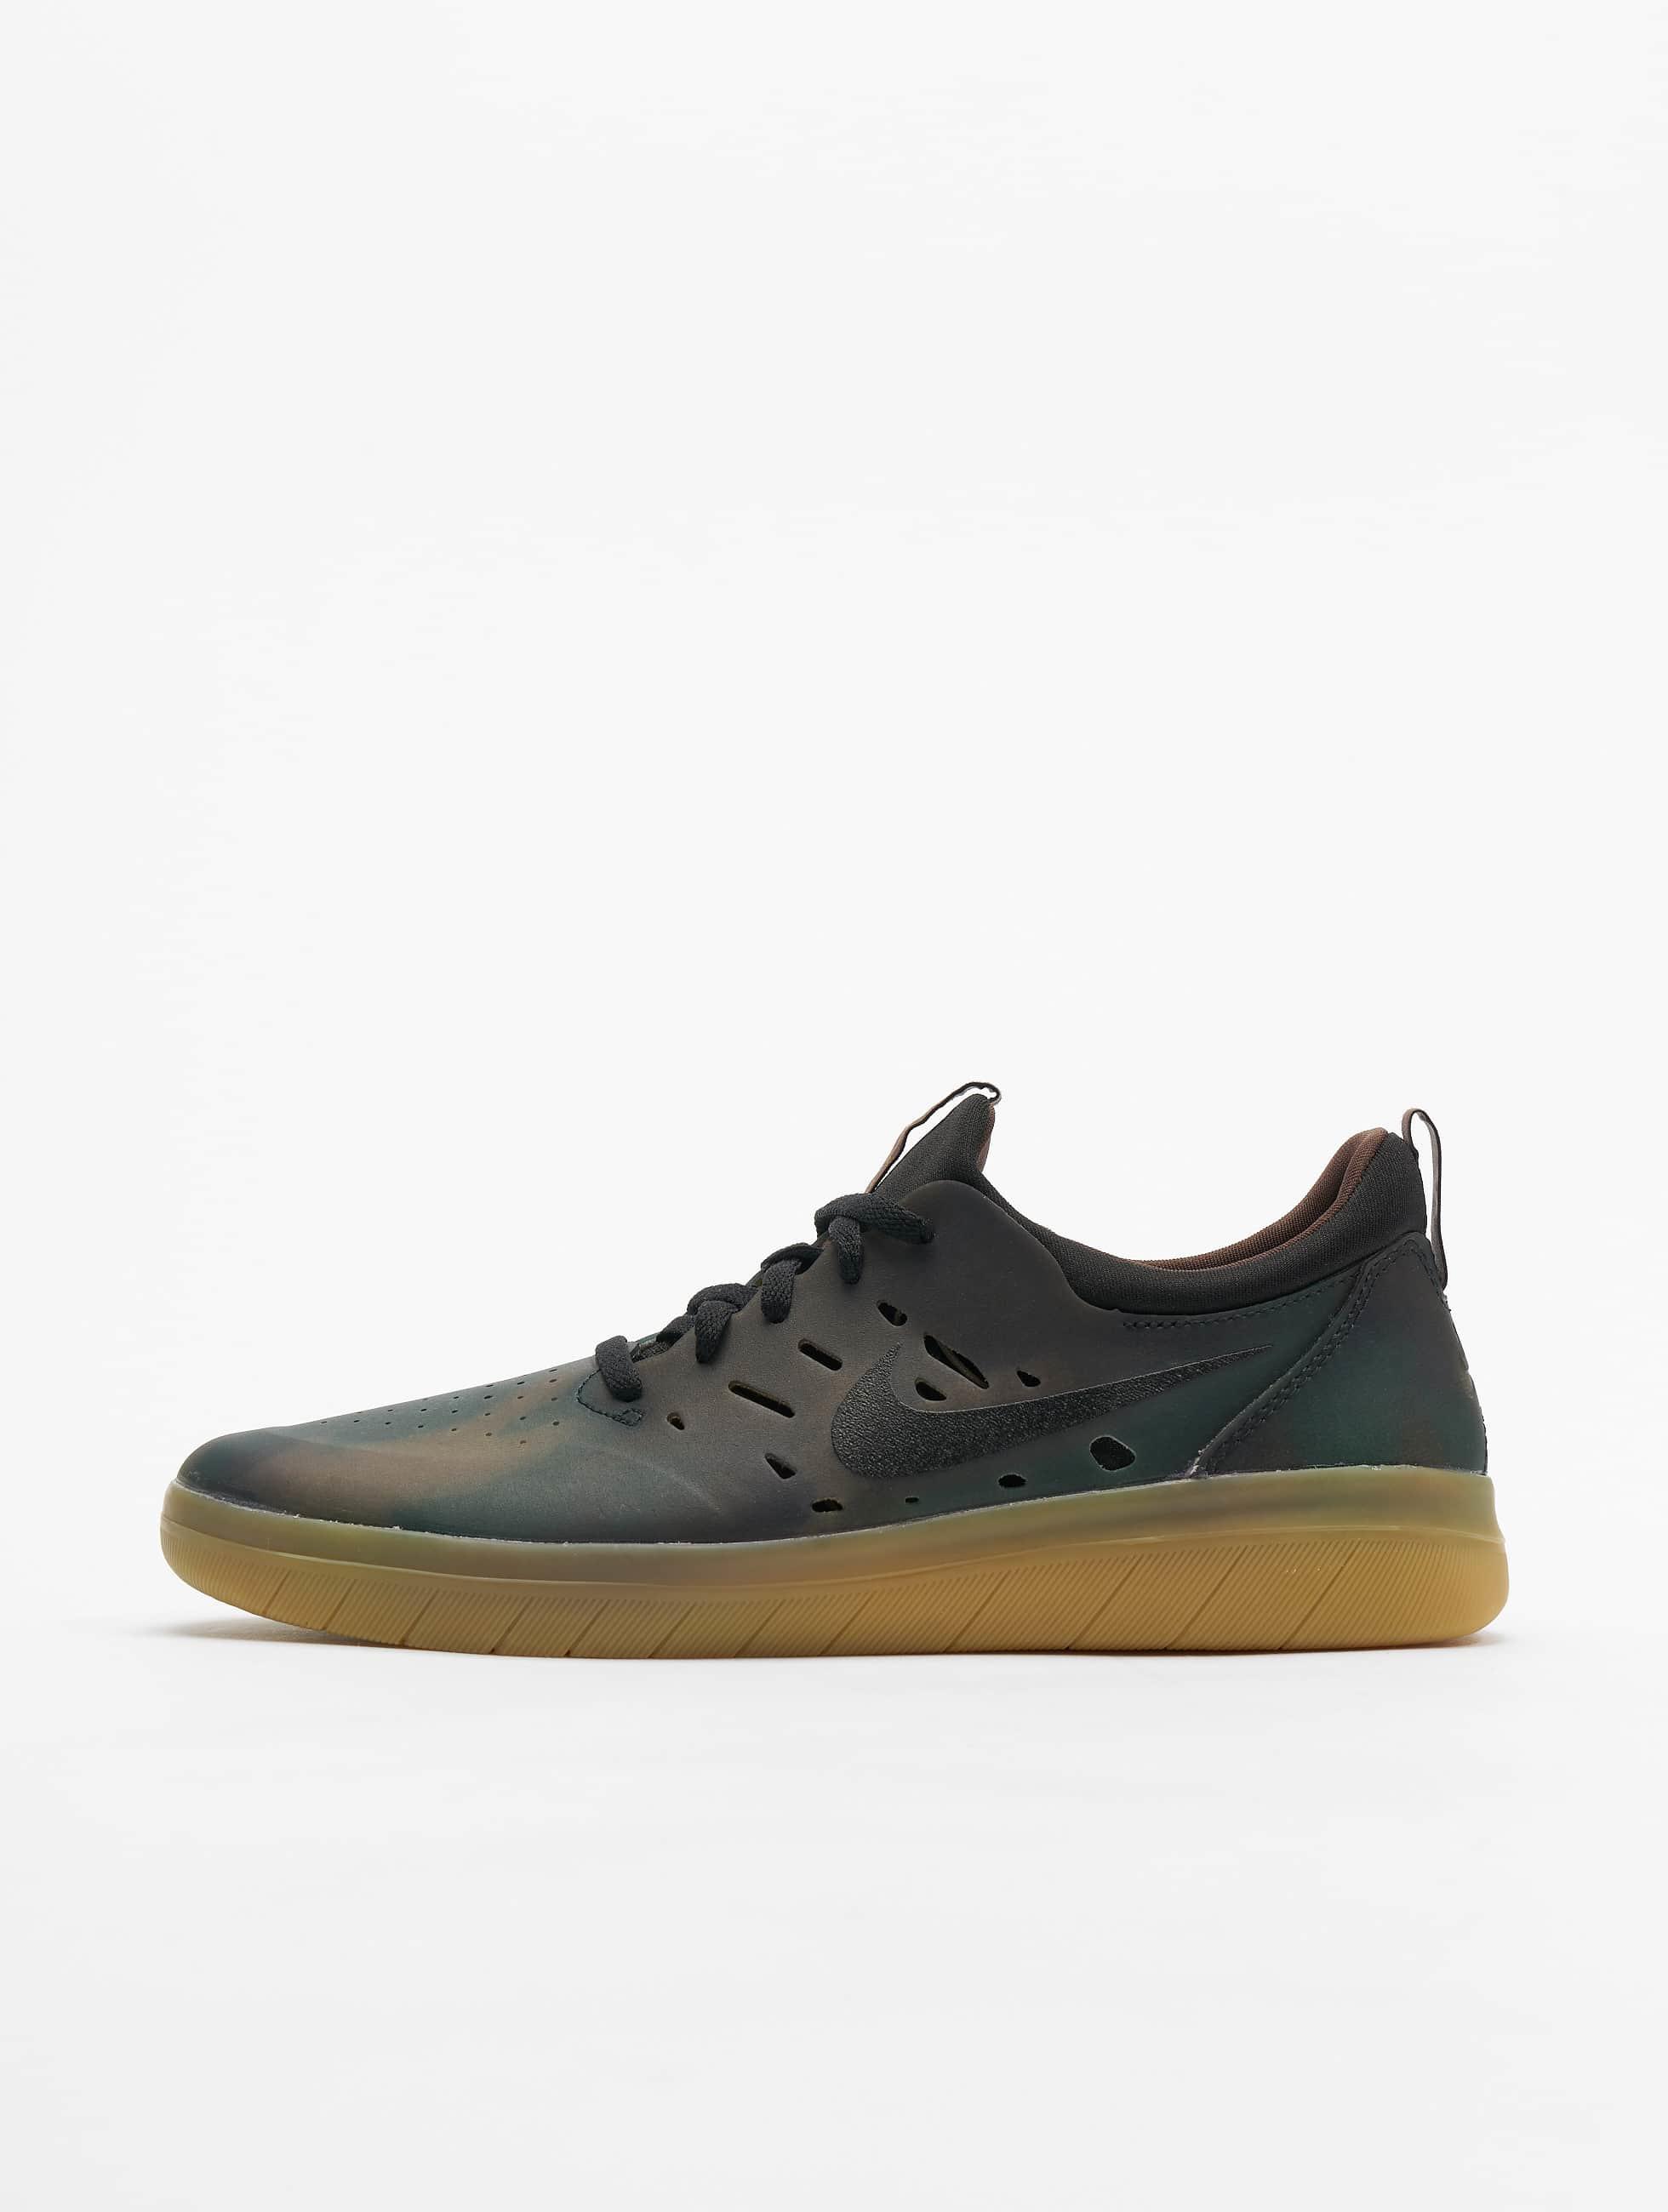 Nike SB Team Classic Schuh (parachute beige)